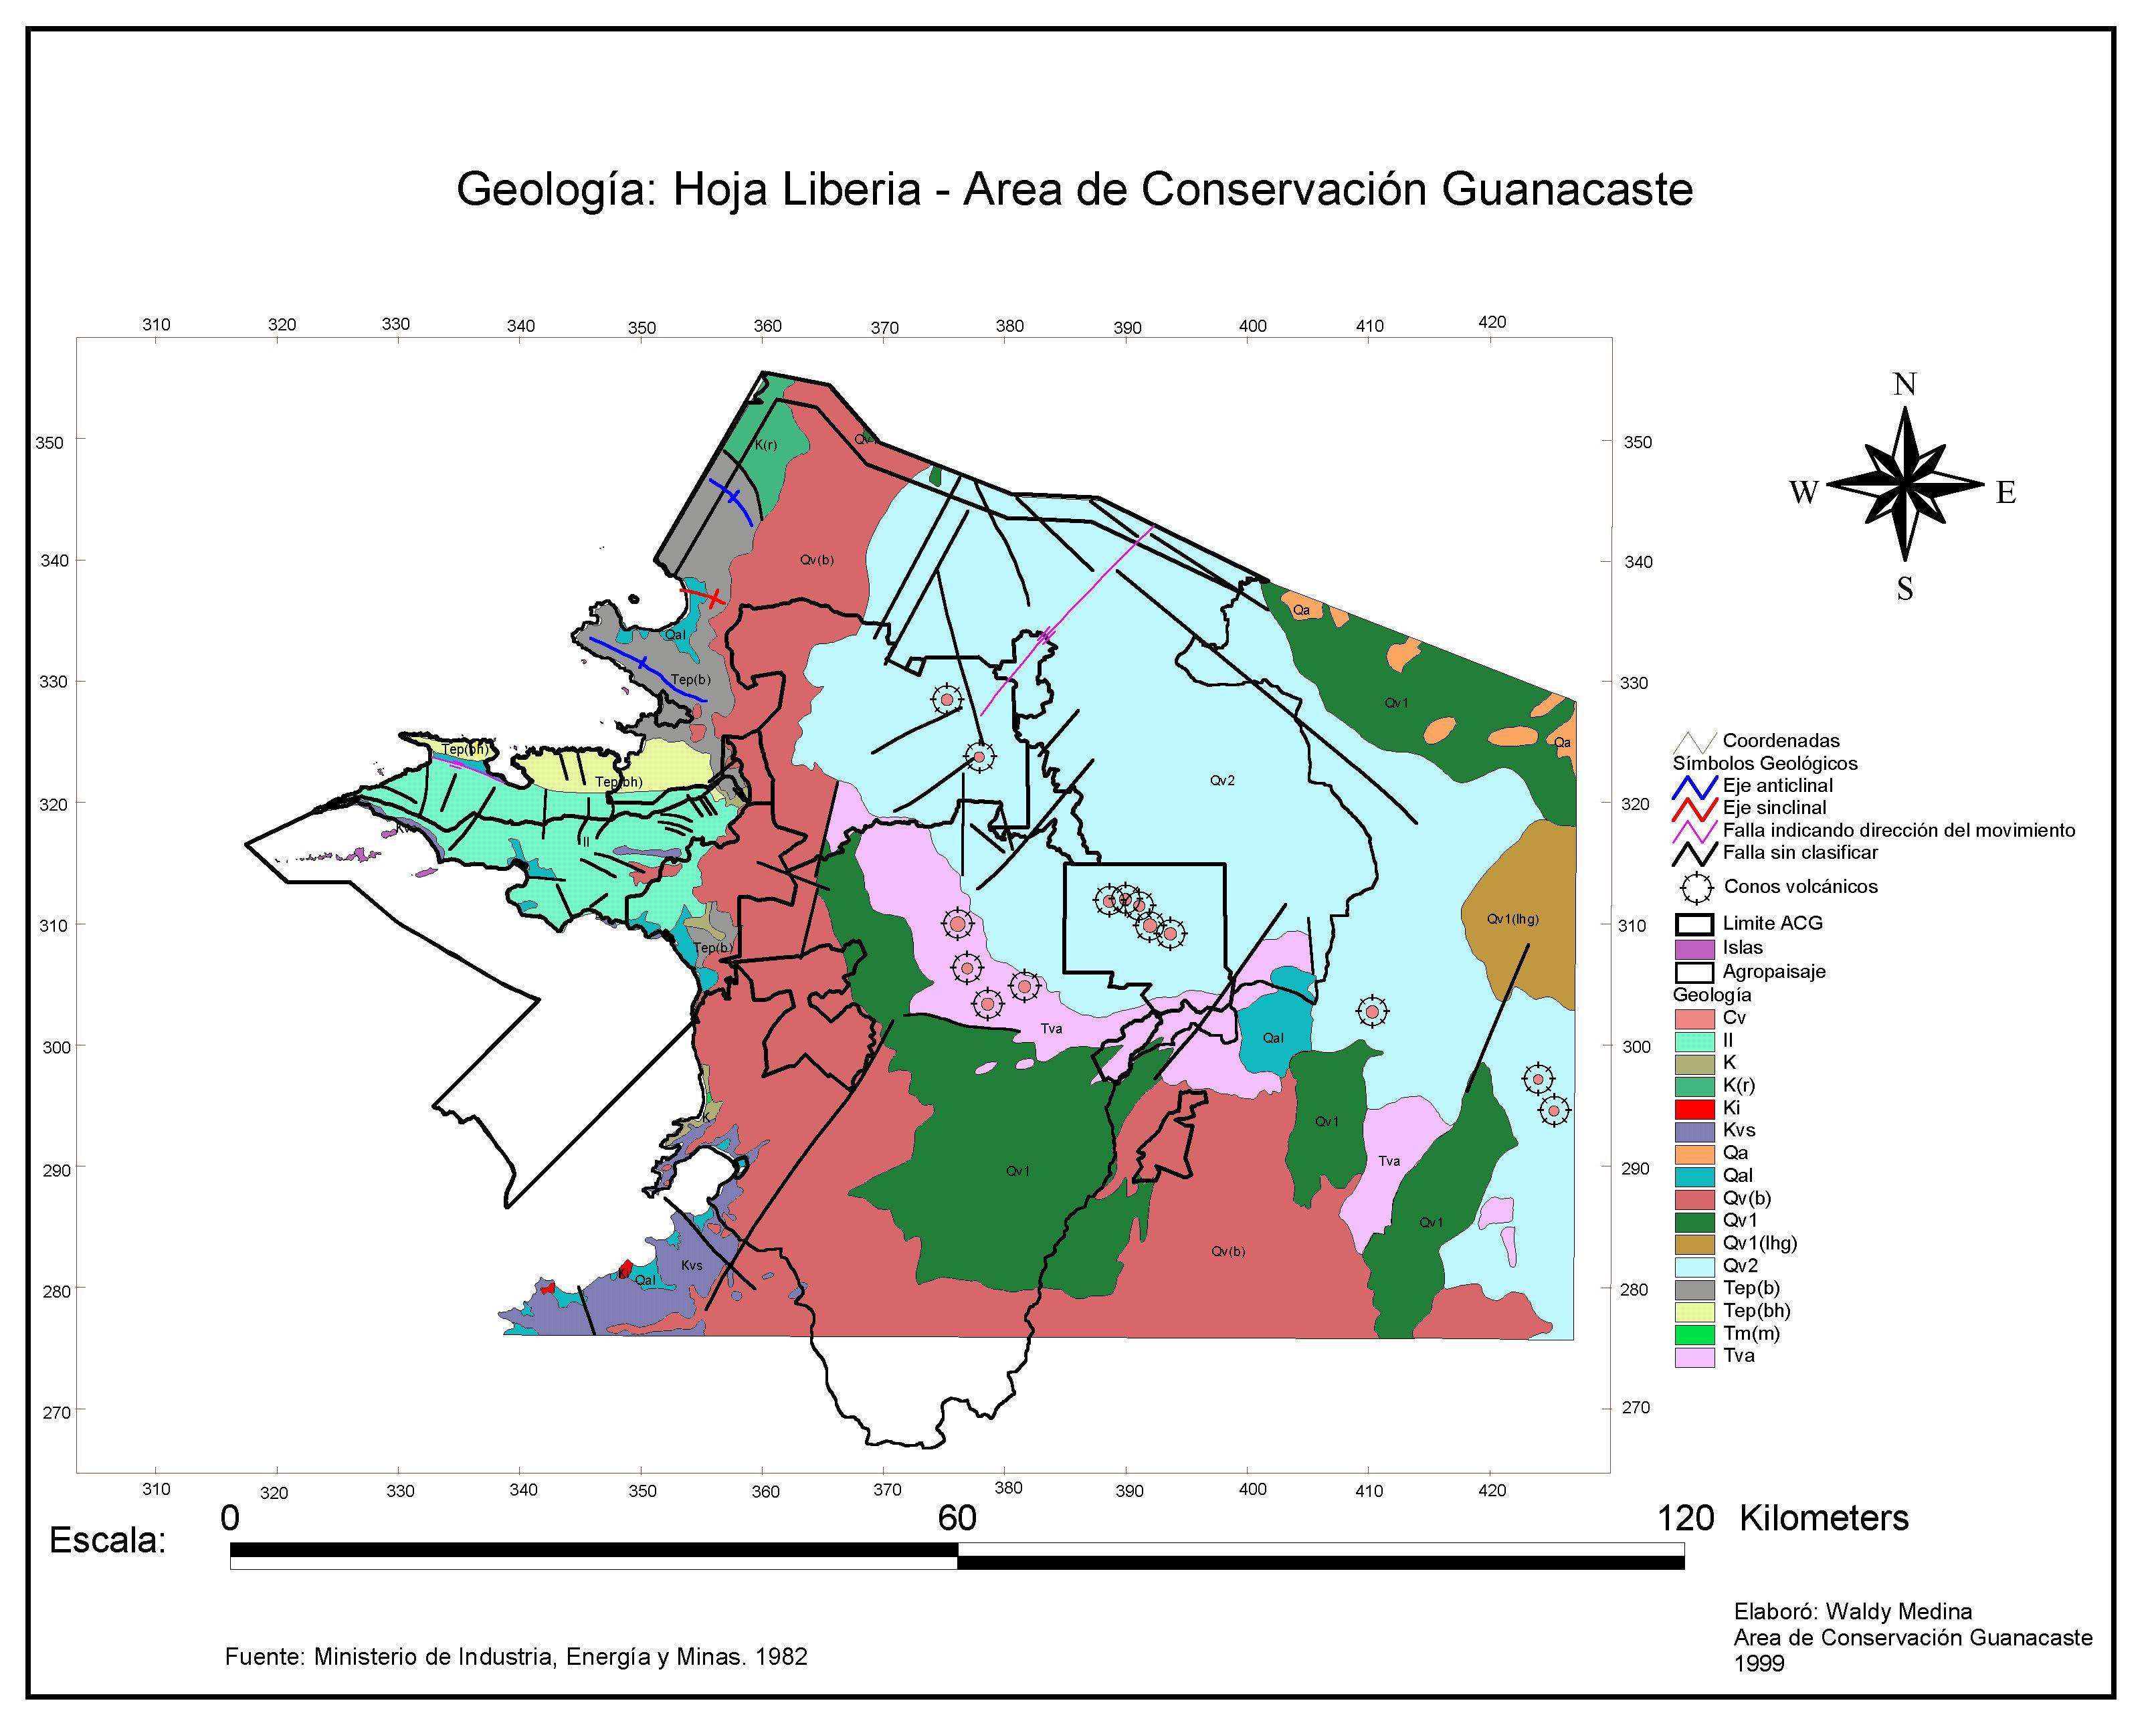 maps and gis investigadoresacg orginvestigadoresacg org